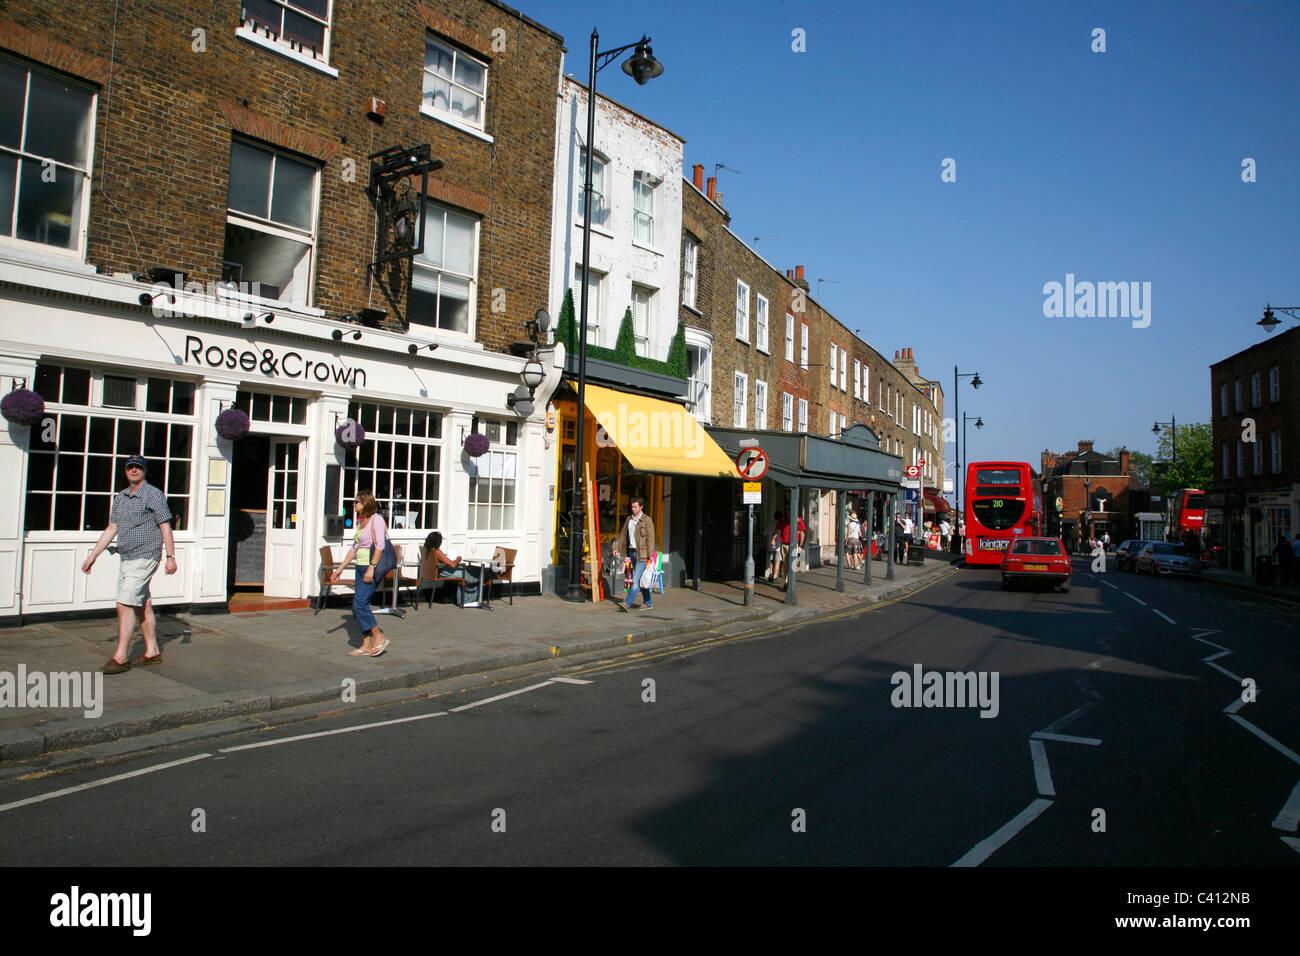 Highgate High Street, Highgate, London, UK - Stock Image